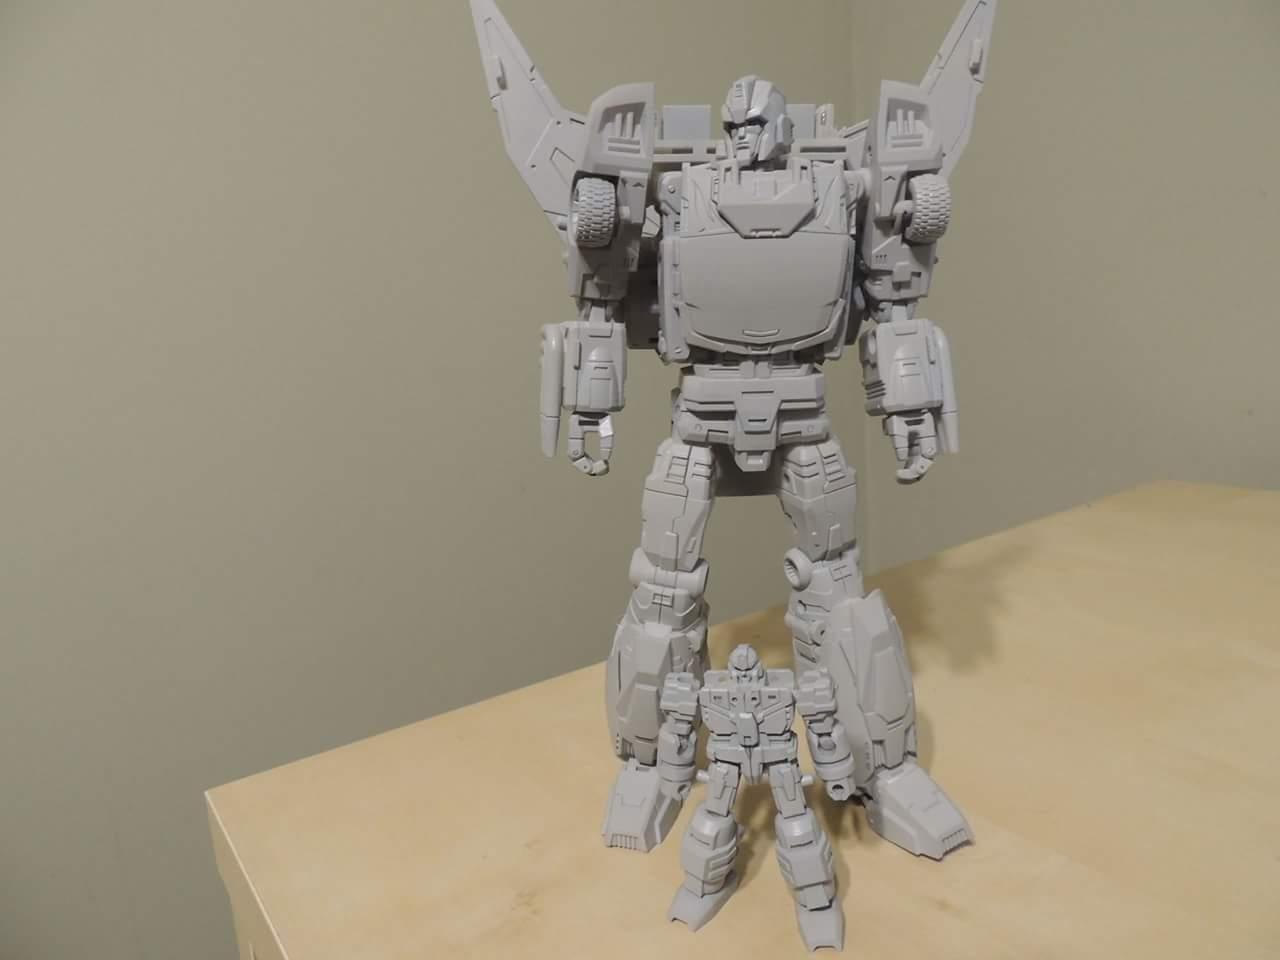 [DX9 Toys] Produit Tiers - Jouet D-06 Carry aka Rodimus et D-06T Terror aka Black Rodimus KveSPsxq